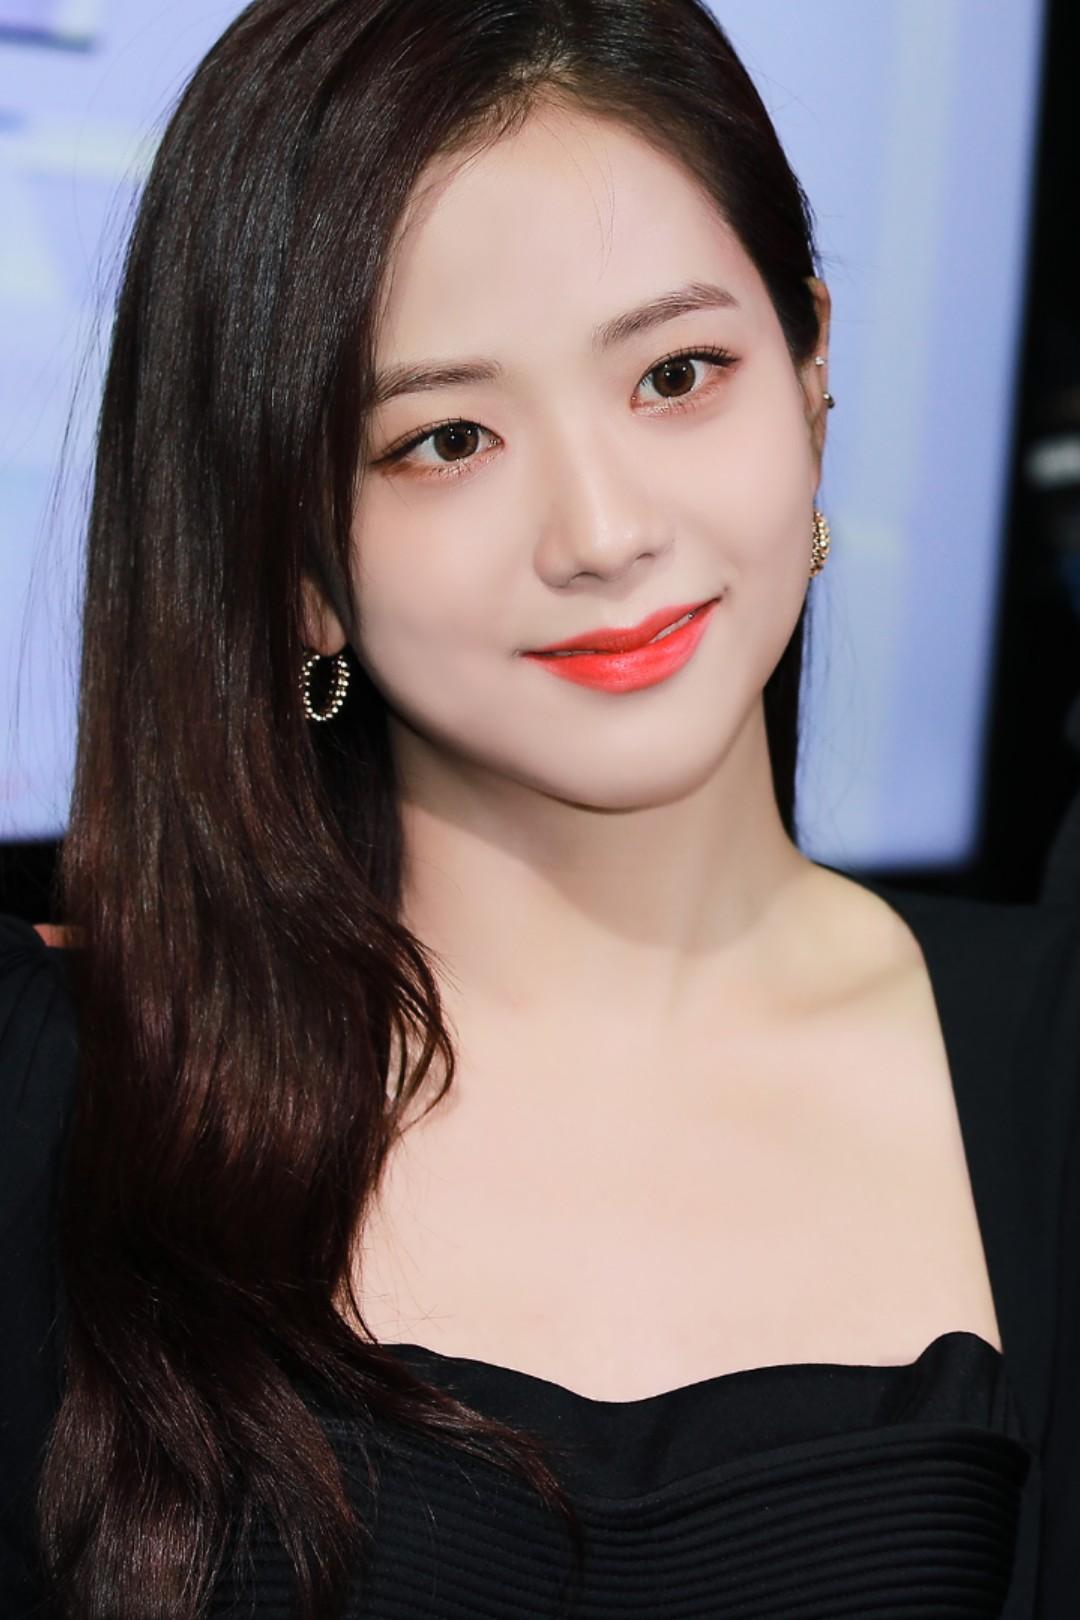 Jisoo make-up routine